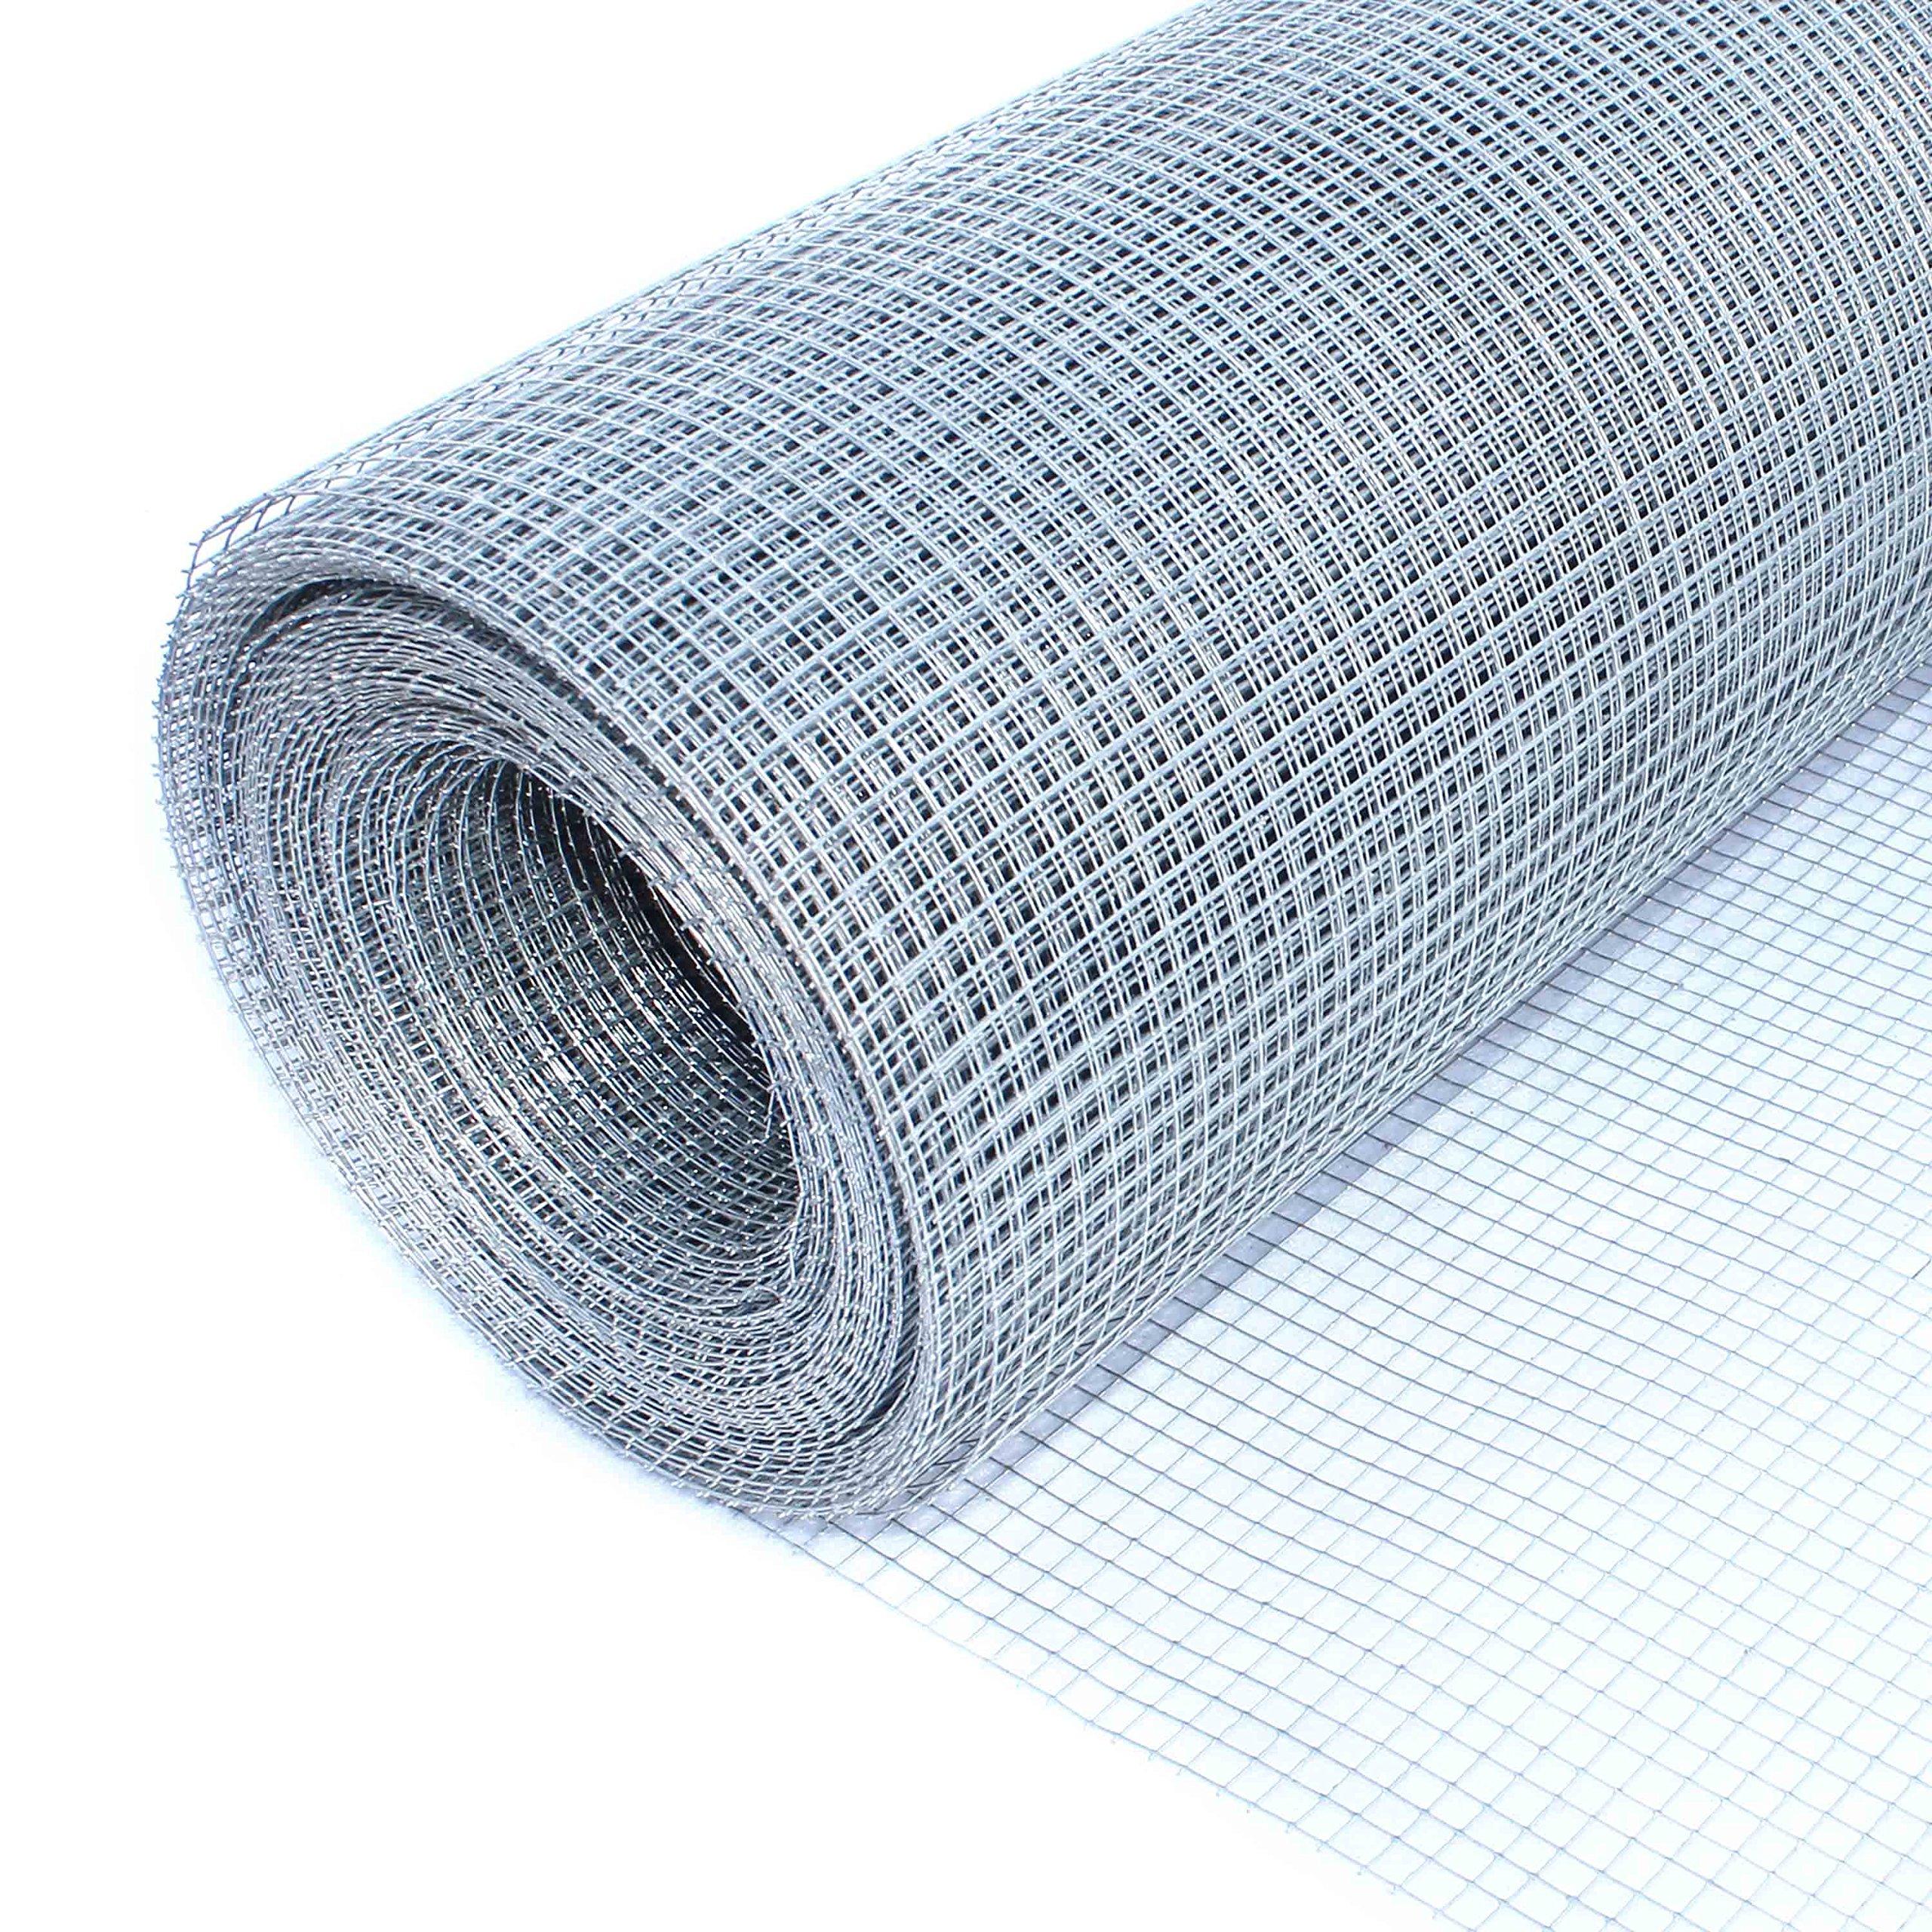 ALEKO Mesh Wire Roll Cloth 23 Gauge Steel 40 Feet Long 40 Inch Height 1/4 Inch Mesh